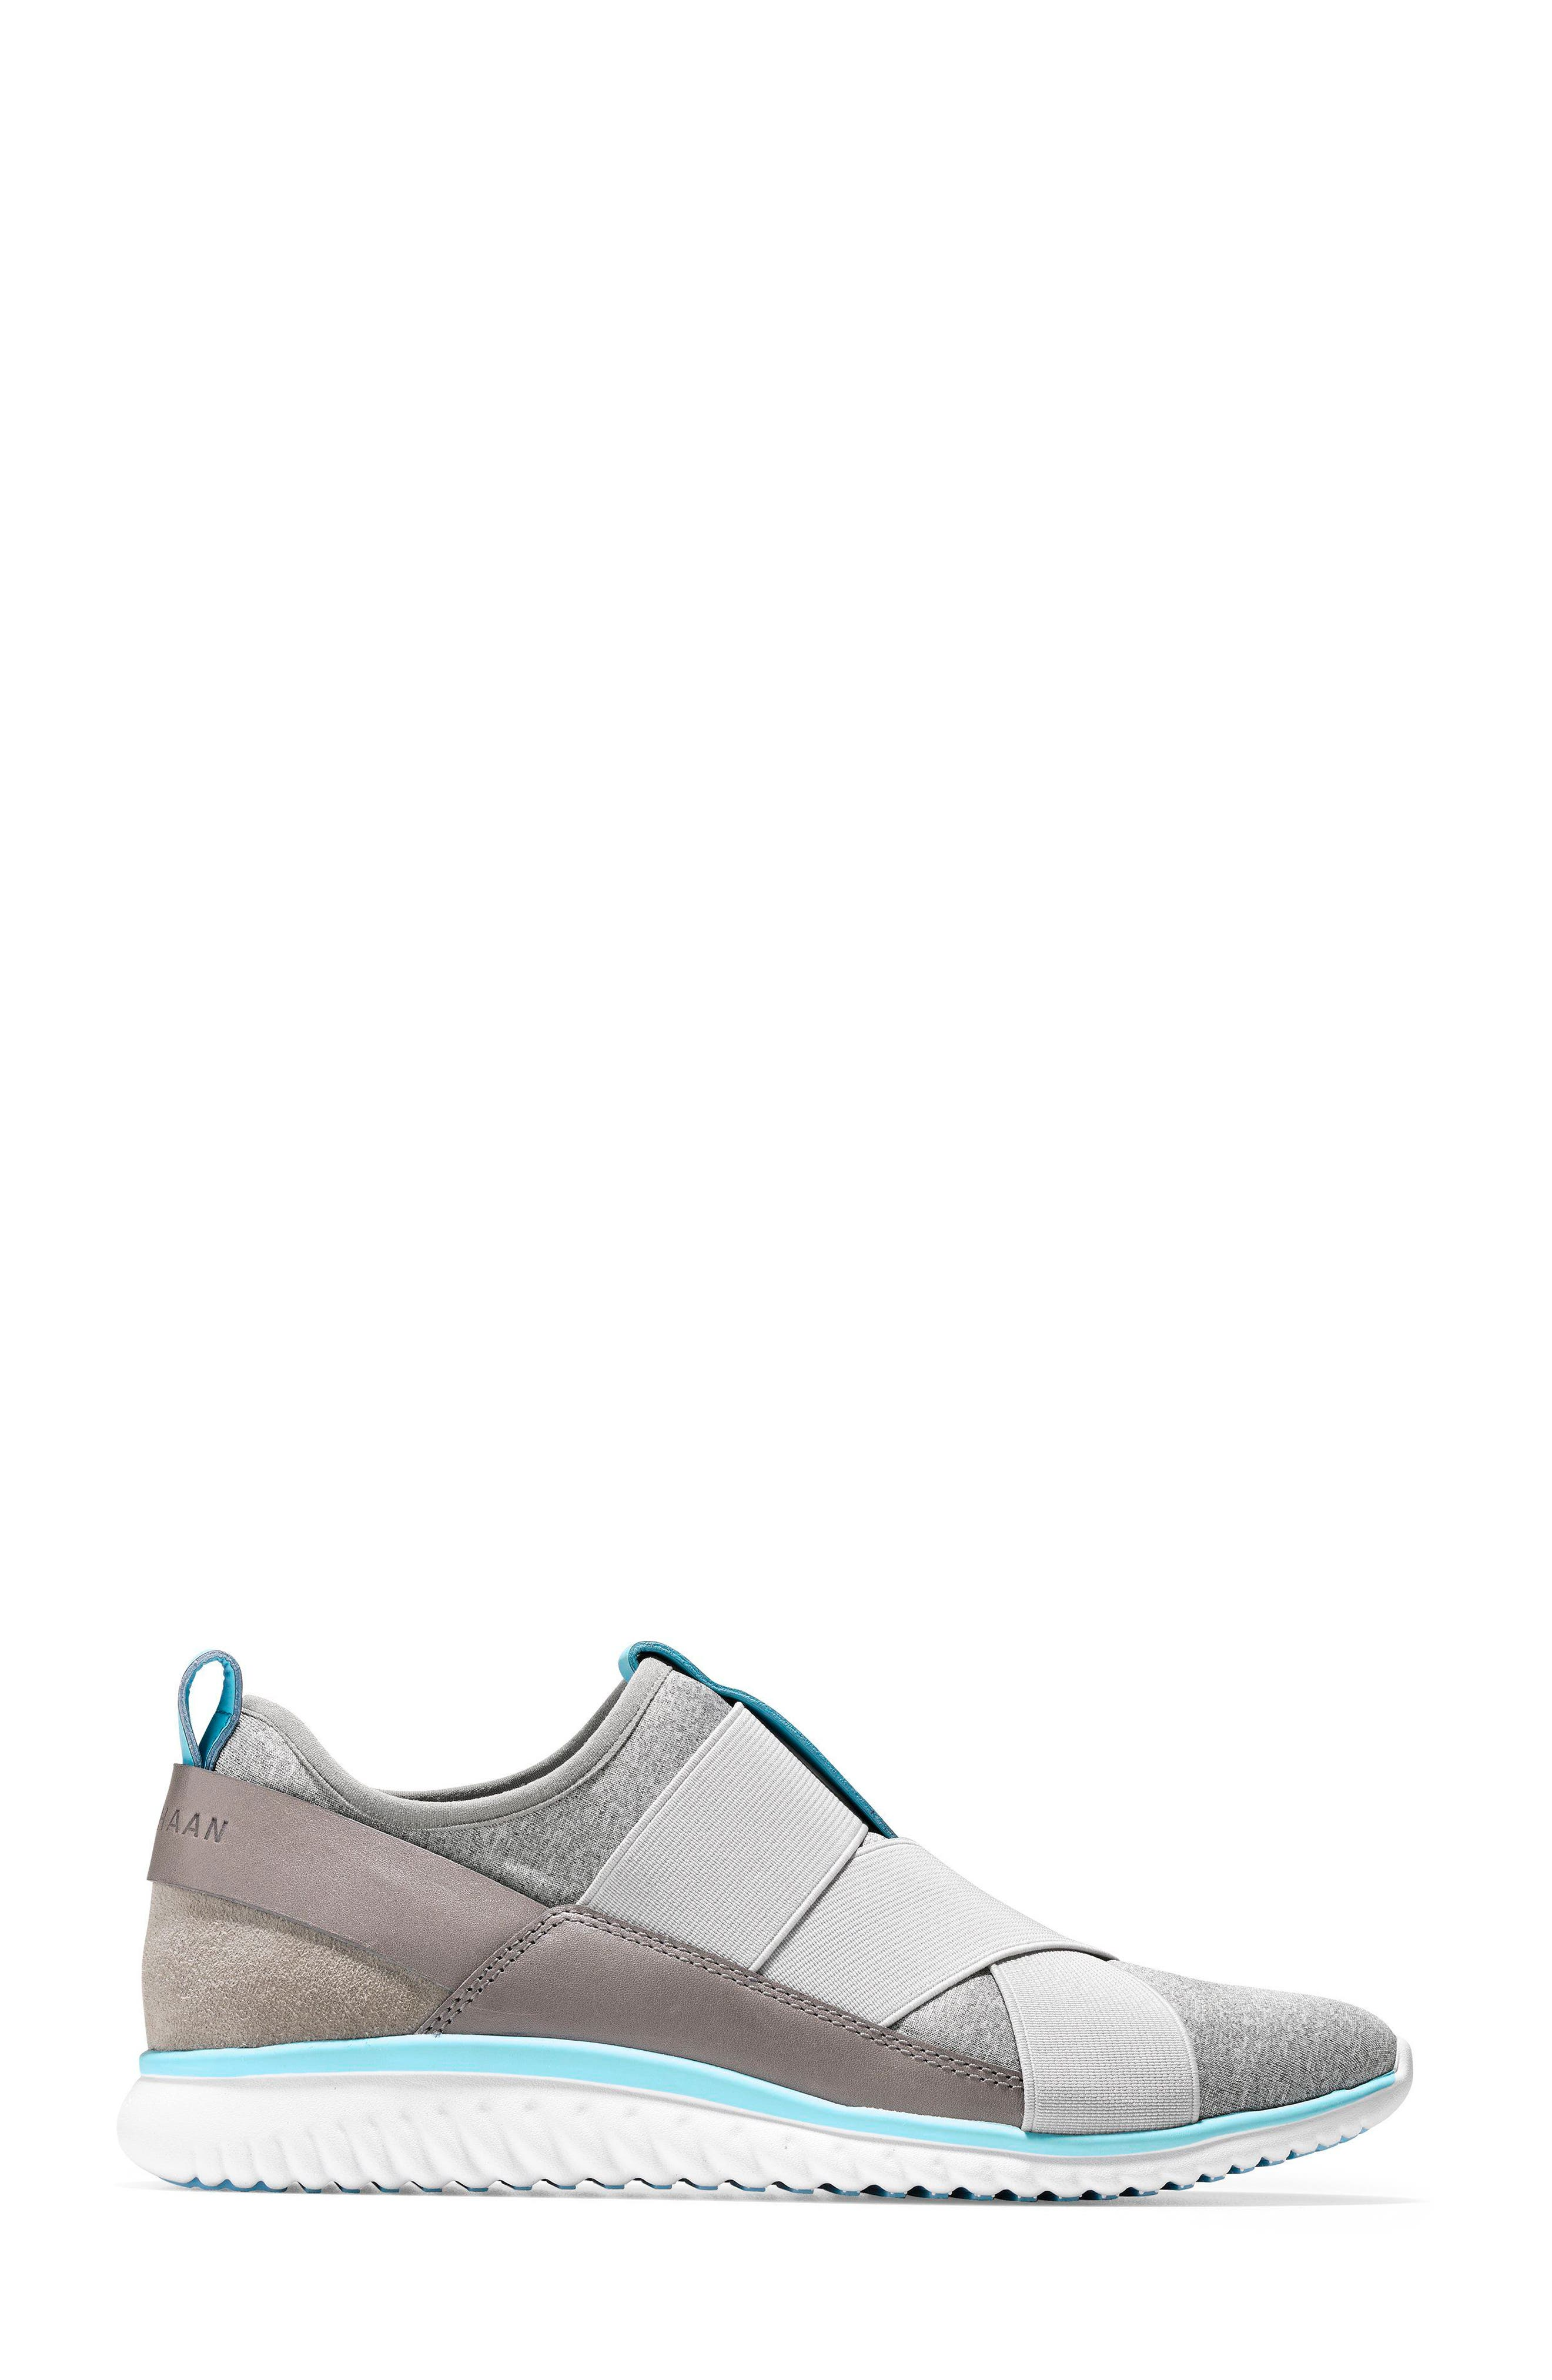 'StudioGrand' Sneaker,                             Alternate thumbnail 19, color,